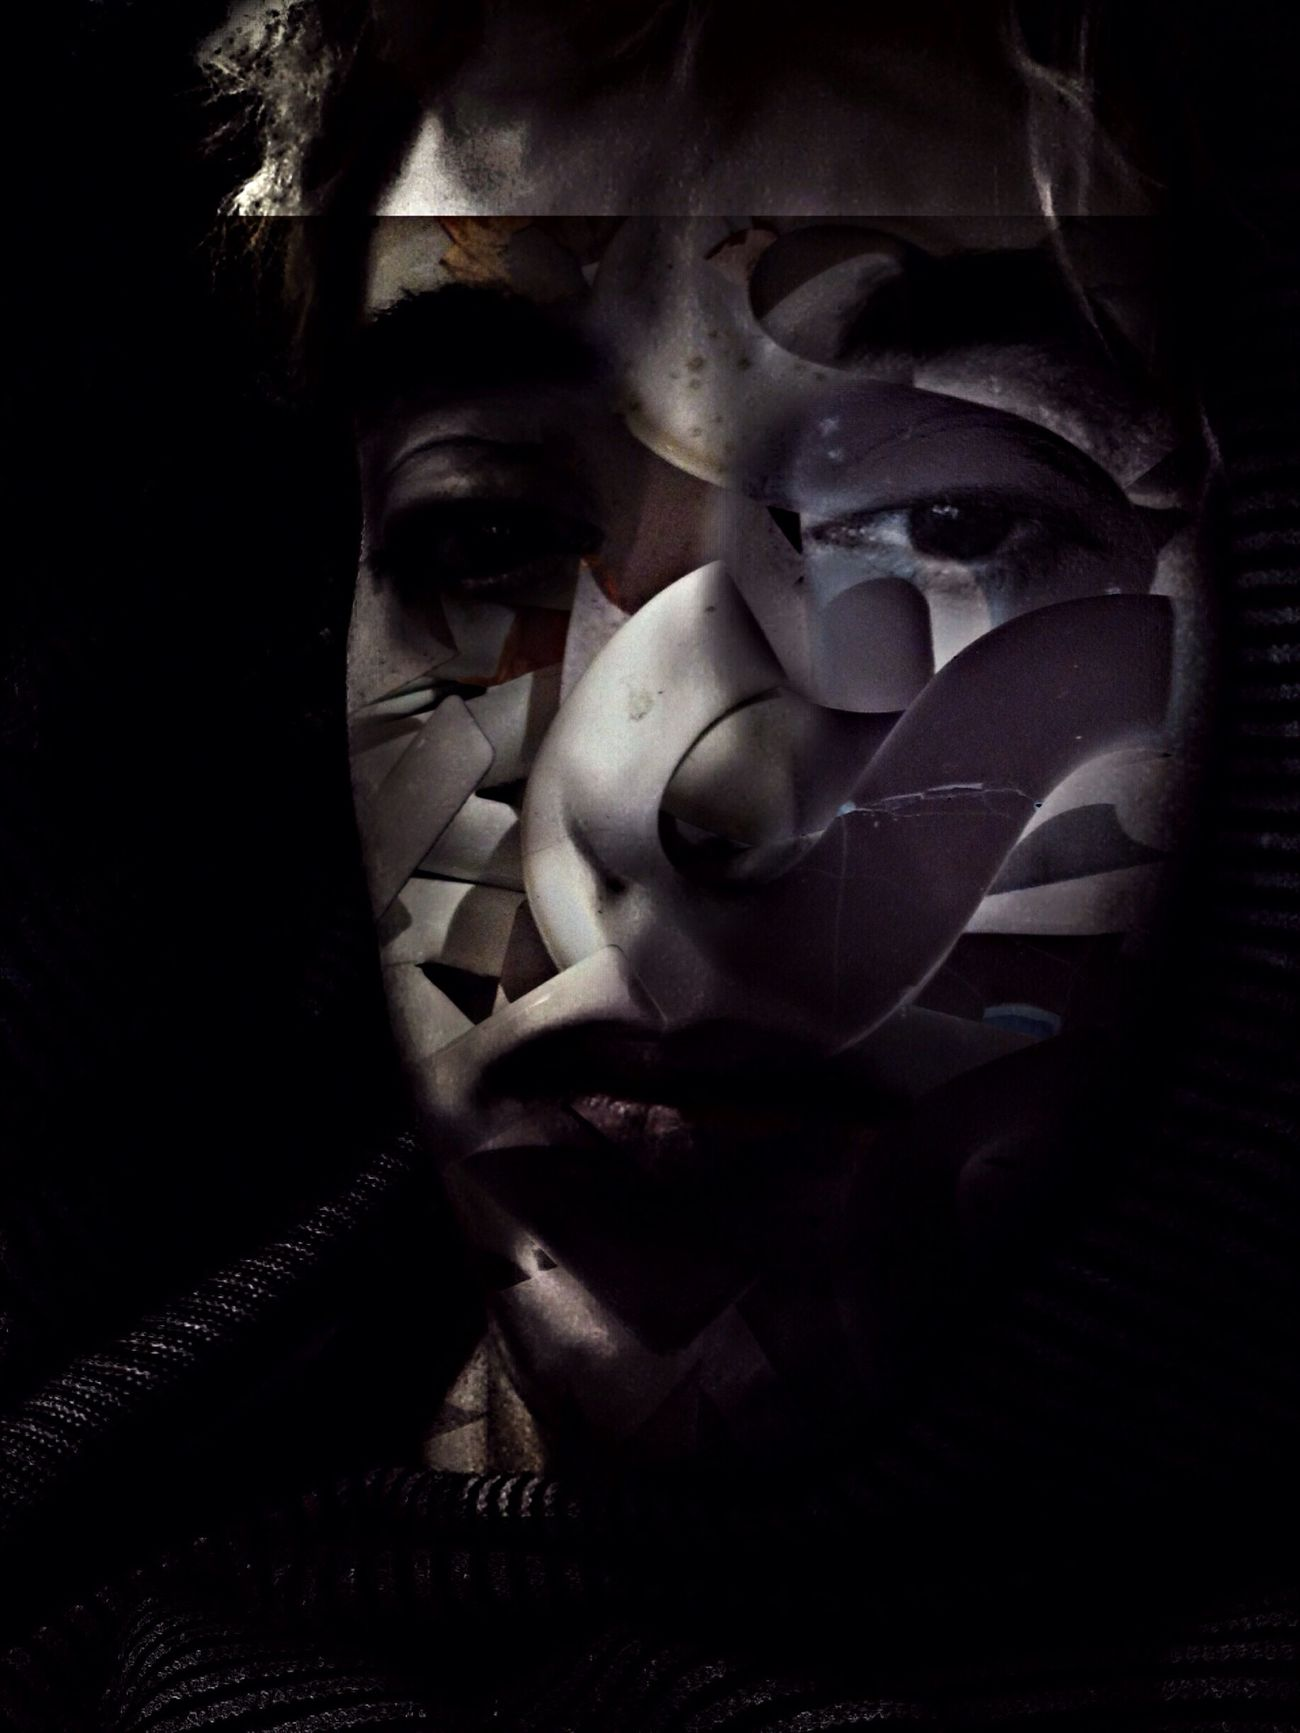 Alphabetti spaghetti - spell out my face Self Portrait NEM Self The Portraitist - 2014 EyeEm Awards Alphabetography